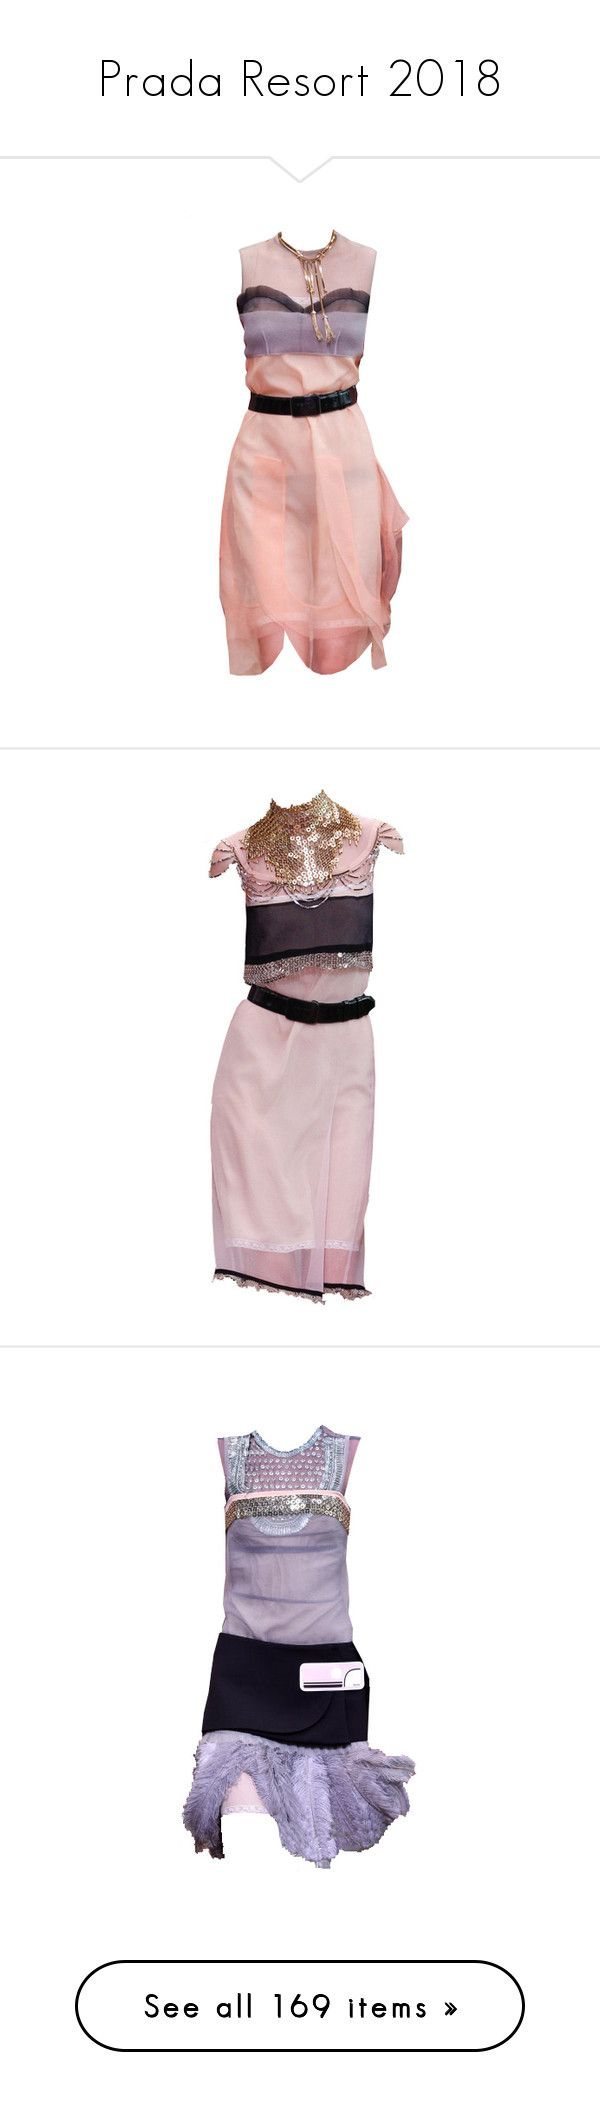 """Prada Resort 2018"" by sella103 ❤ liked on Polyvore featuring edit, prada, dresses, green, sleeveless dress, silk pleated dress, mock neck dress, silk dress, outerwear and coats"